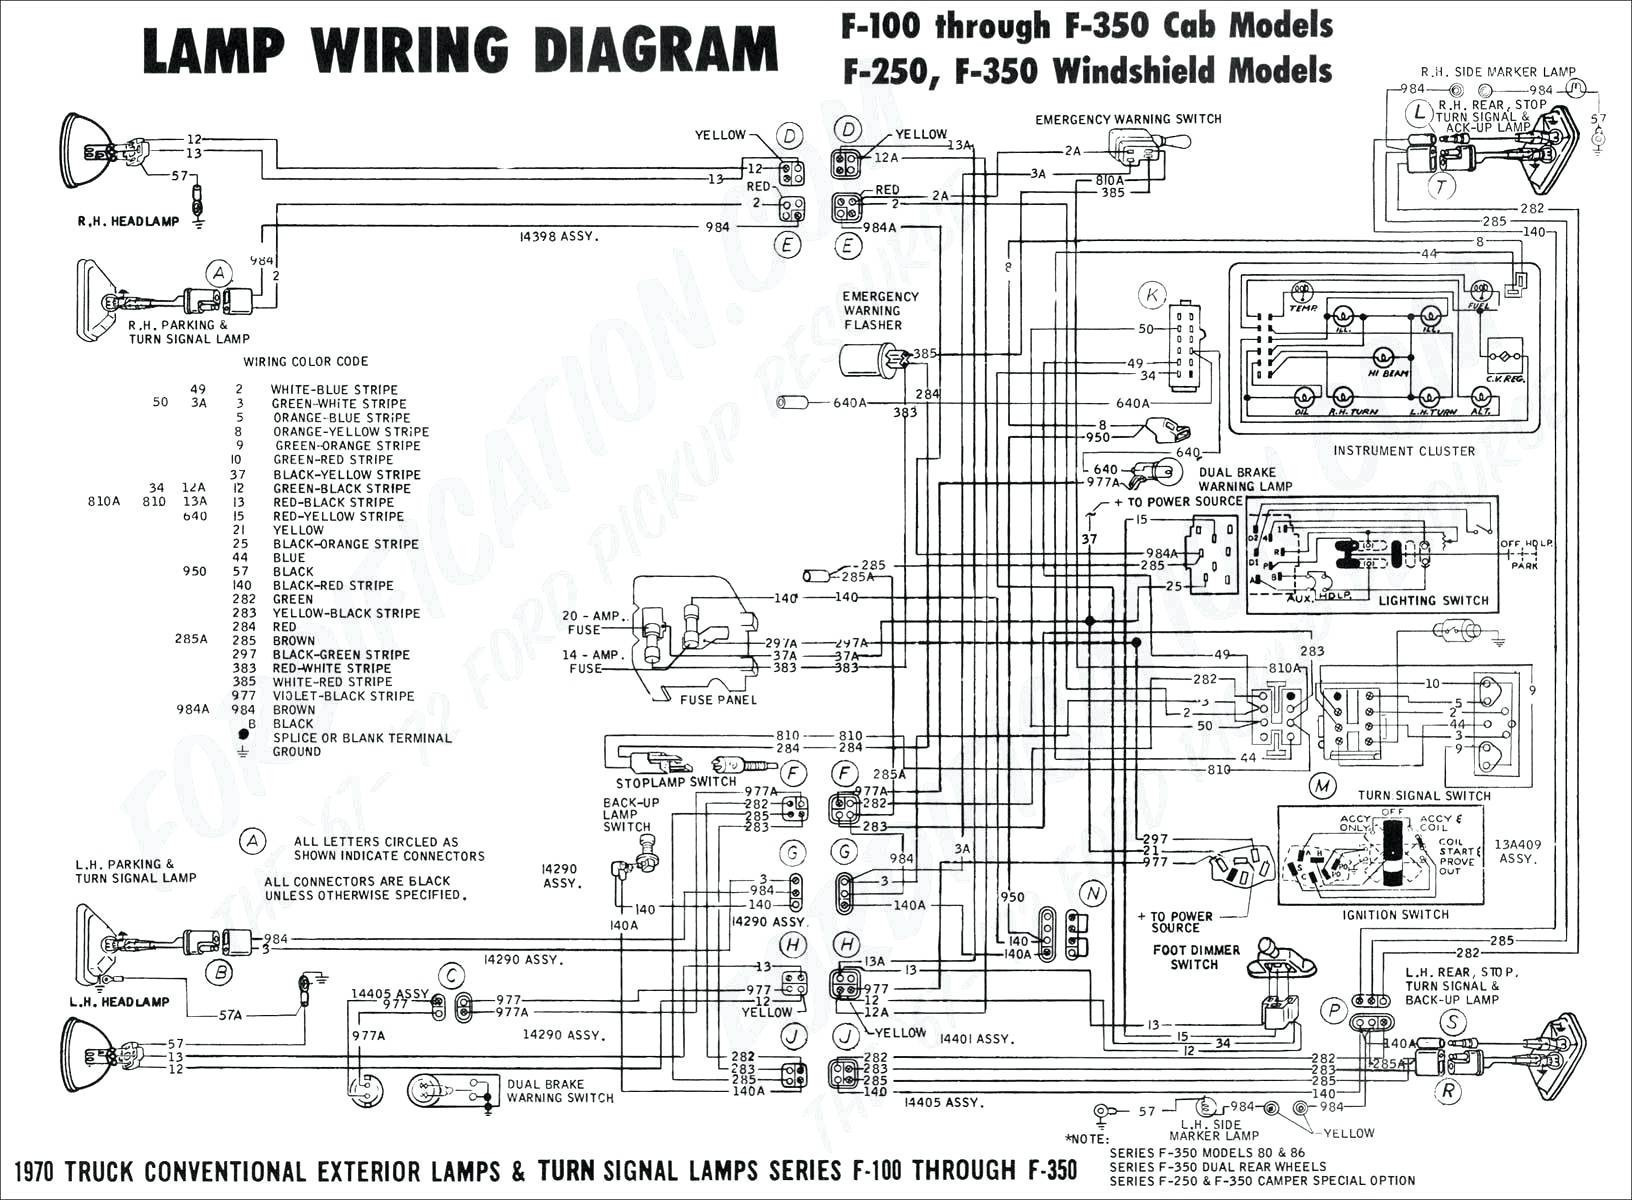 Falcon 90 Wiring Diagram - G2 wiring diagram9.erc.institut-triskell-de-diamant.fr